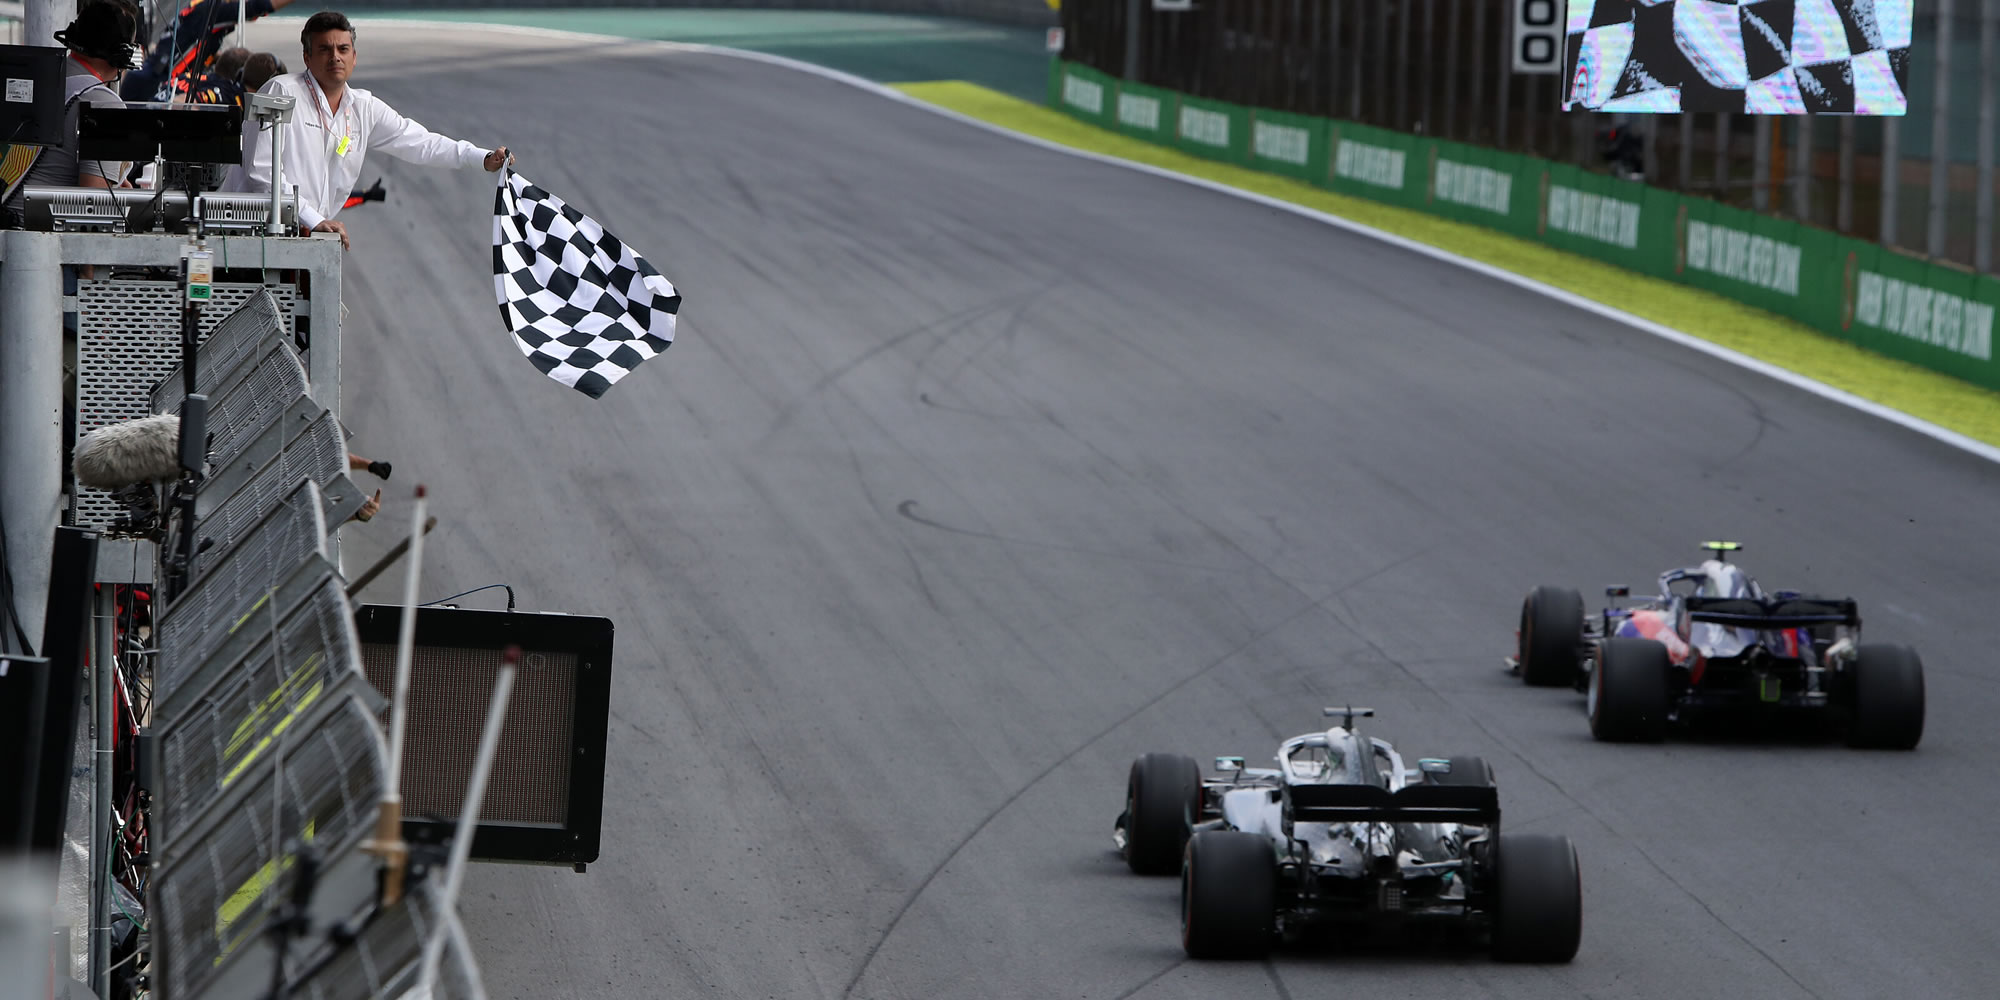 Brazil GP 2019 – Podium! 20